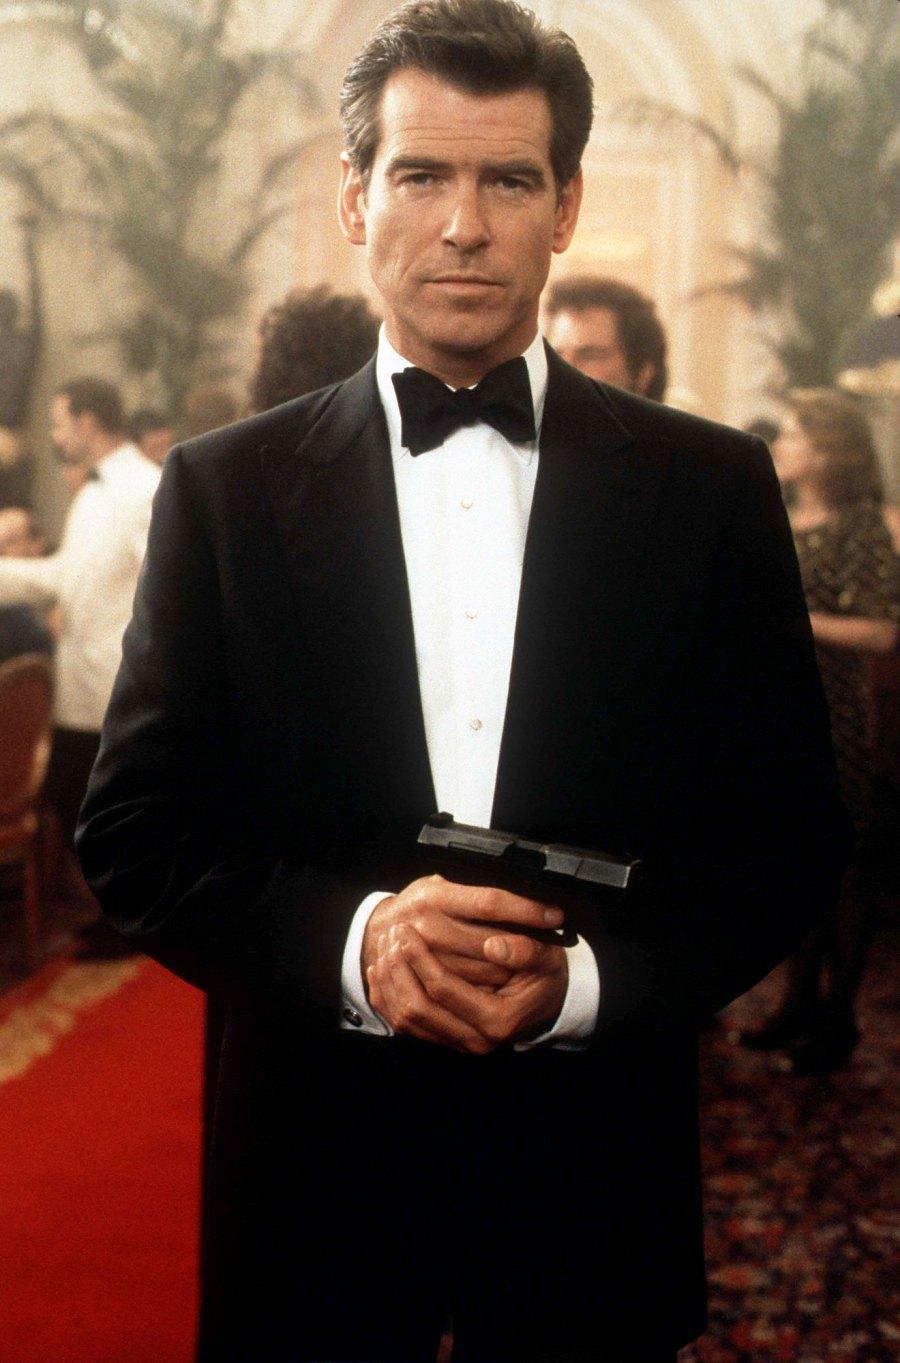 Pierce Brosnan Stars Who Have Played James Bond